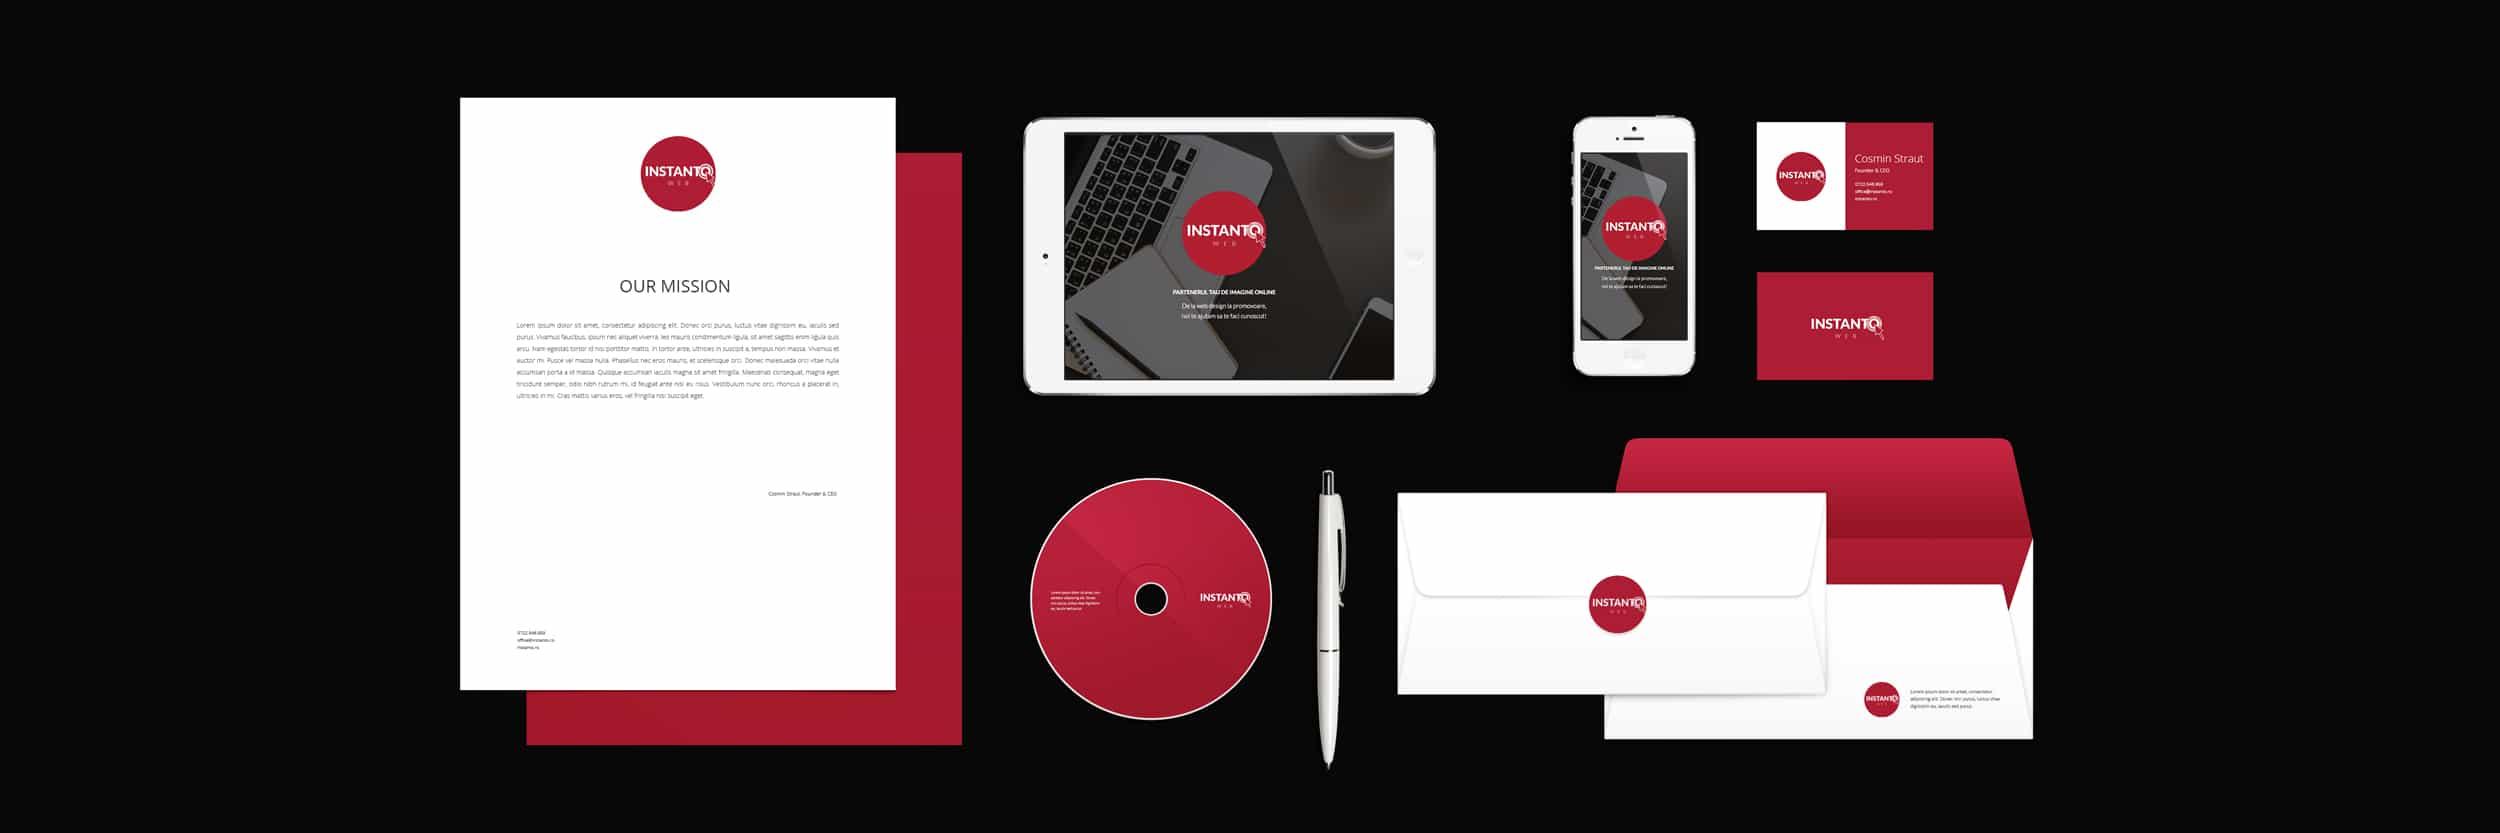 branding-mockup-2